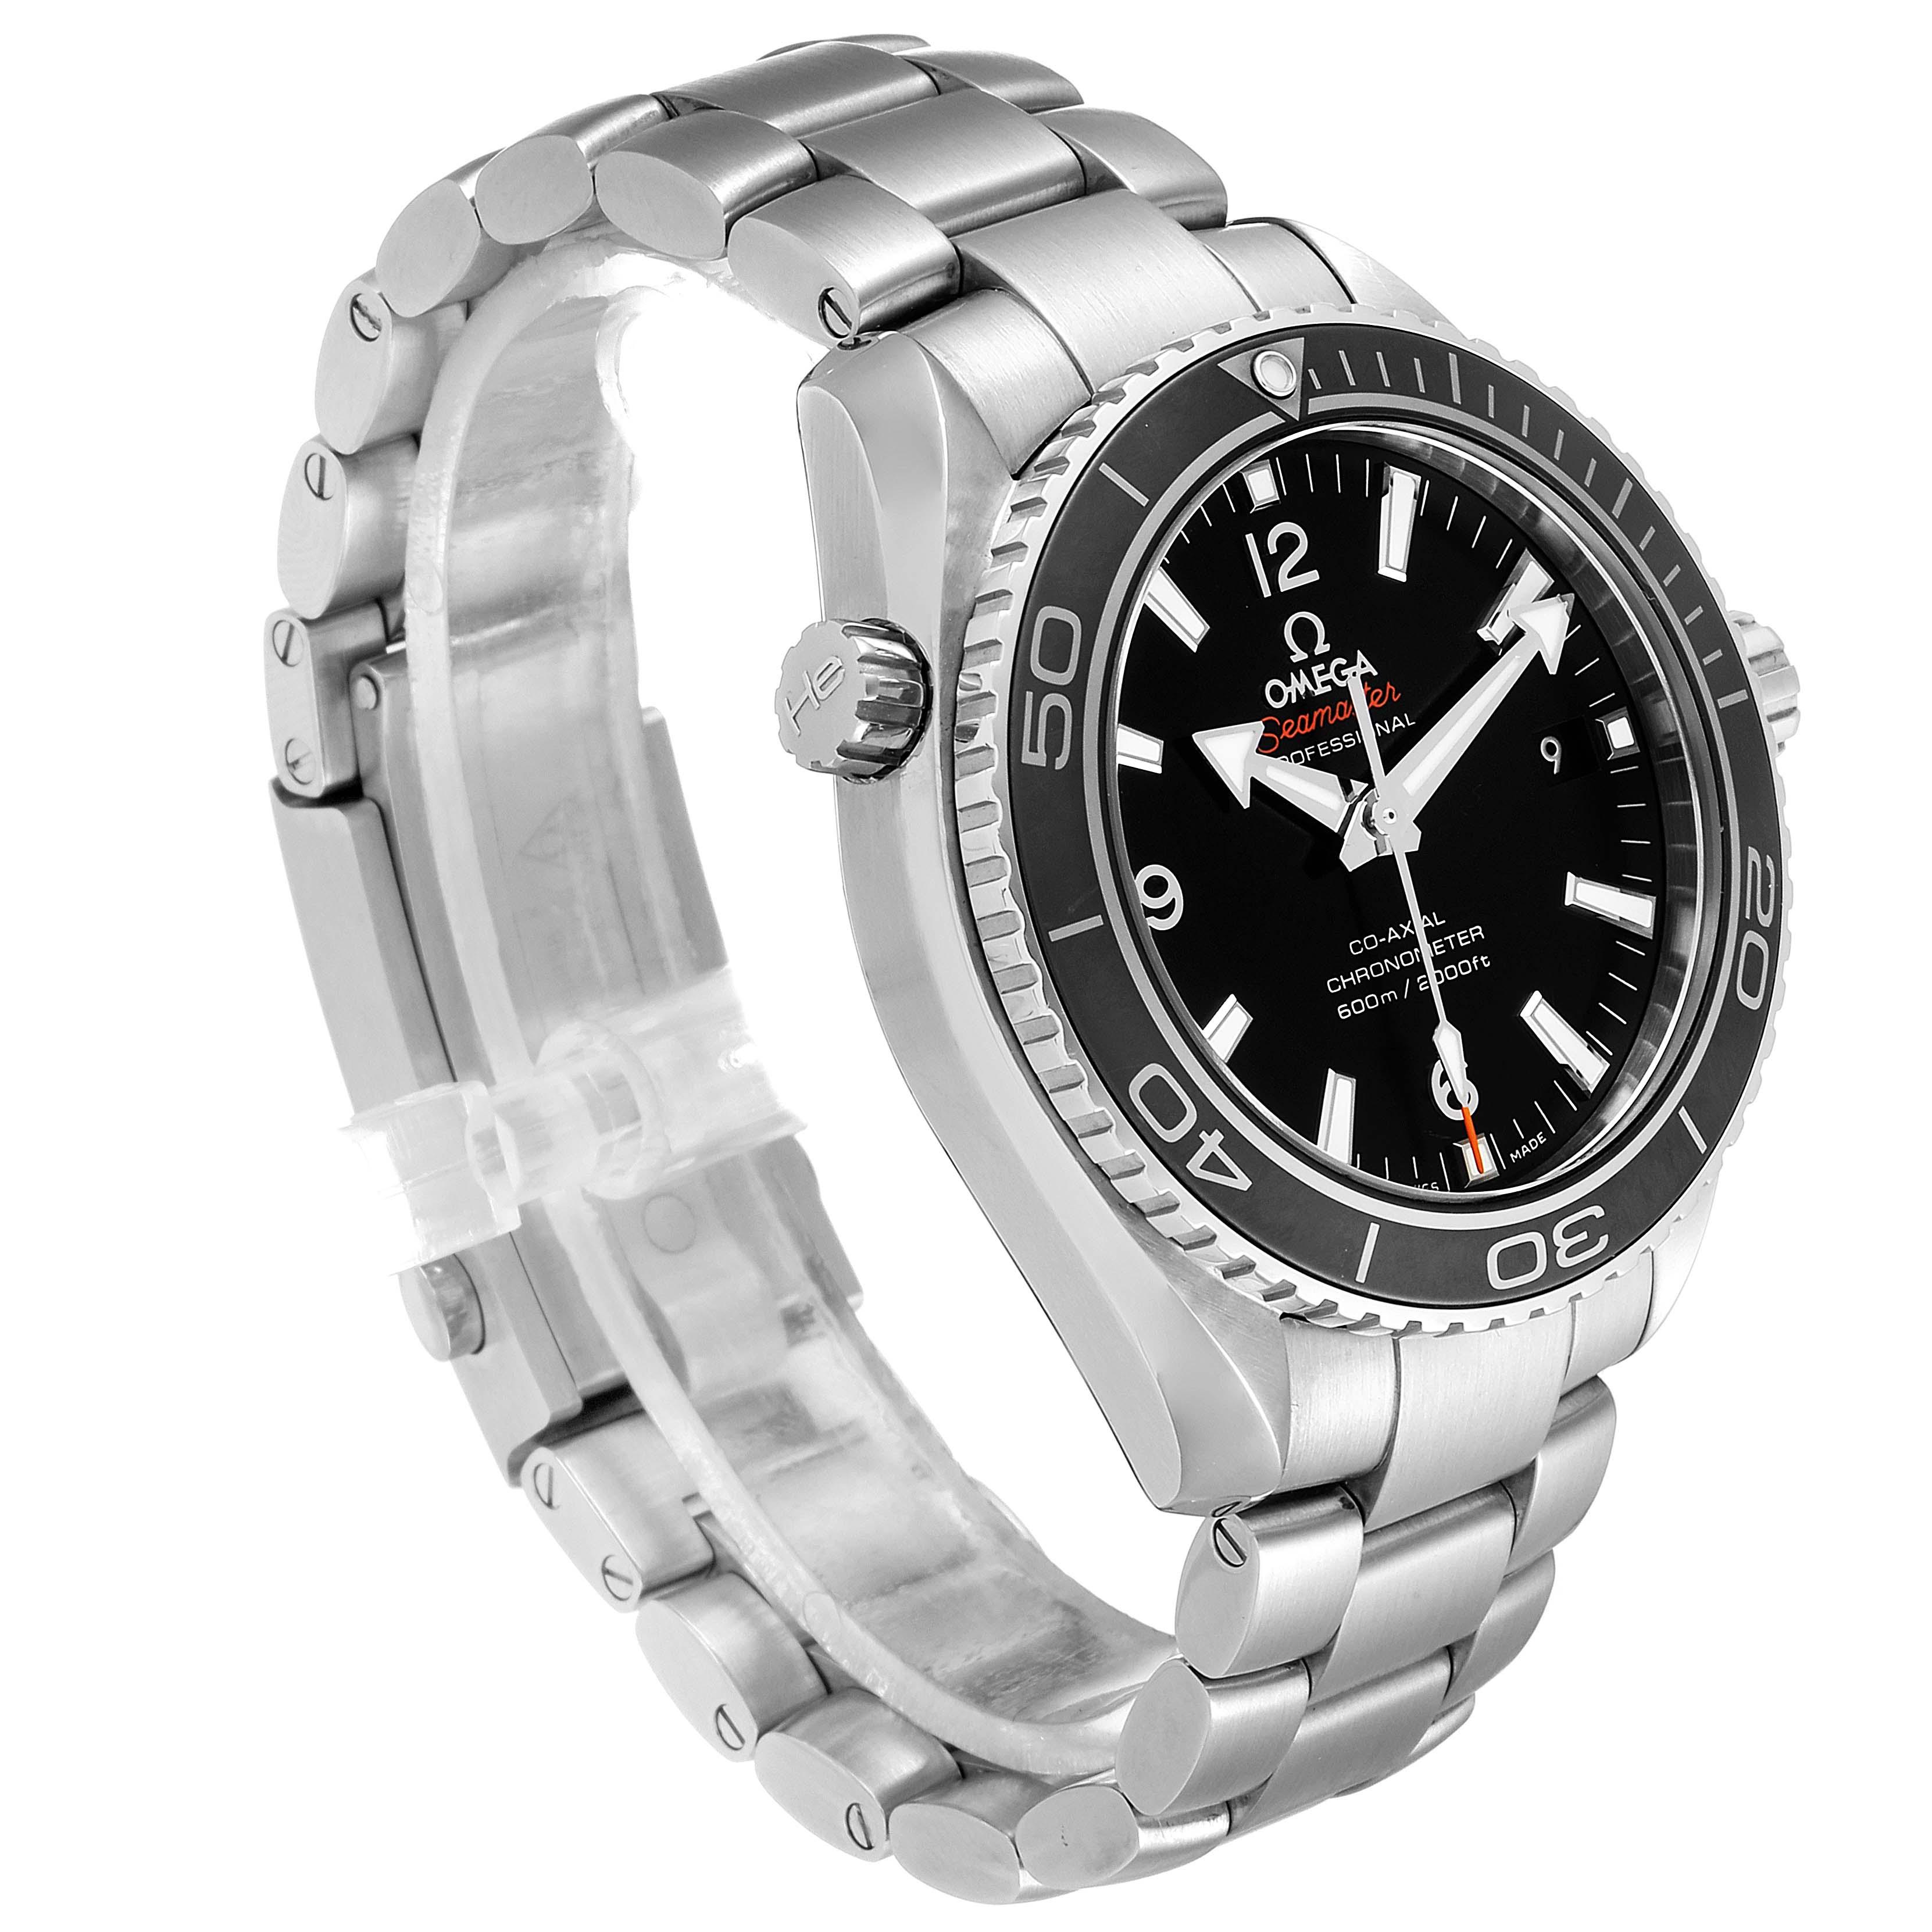 Omega Seamaster Planet Ocean Steel Mens Watch 232.30.42.21.01.001 Card SwissWatchExpo